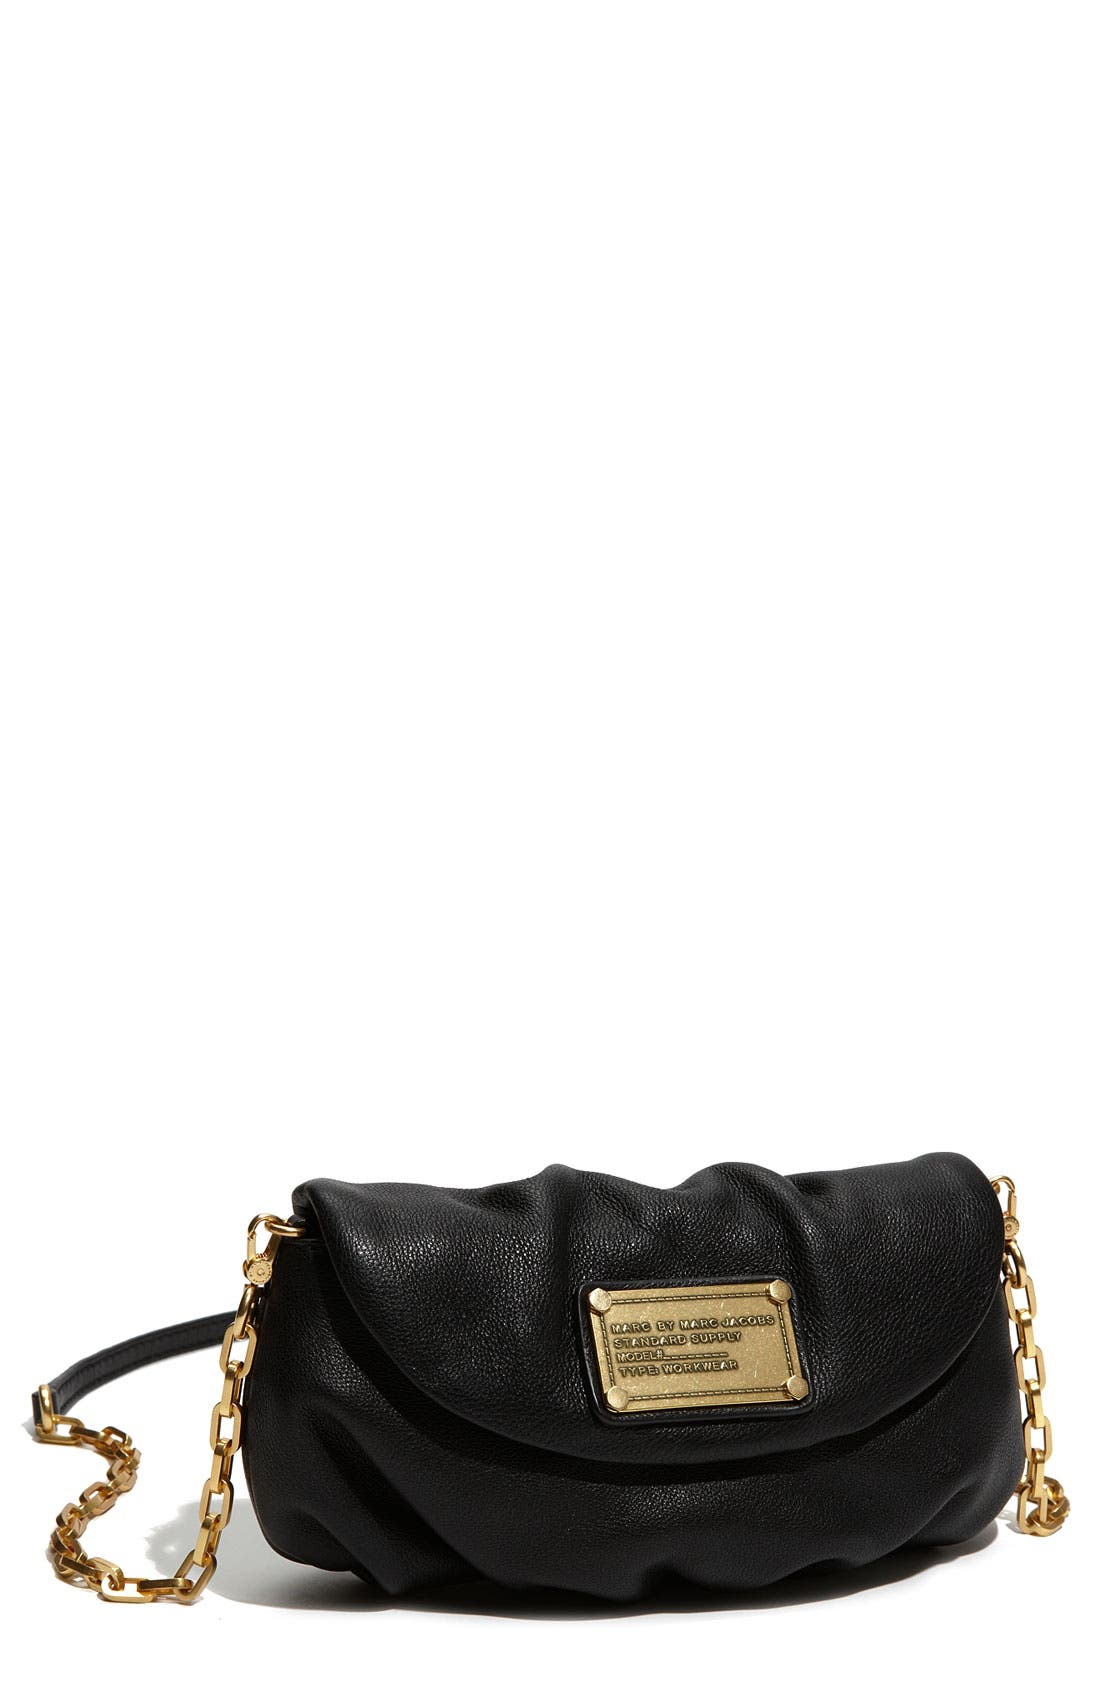 Main Image - MARC BY MARC JACOBS 'Classic Q - Karlie' Crossbody Flap Bag